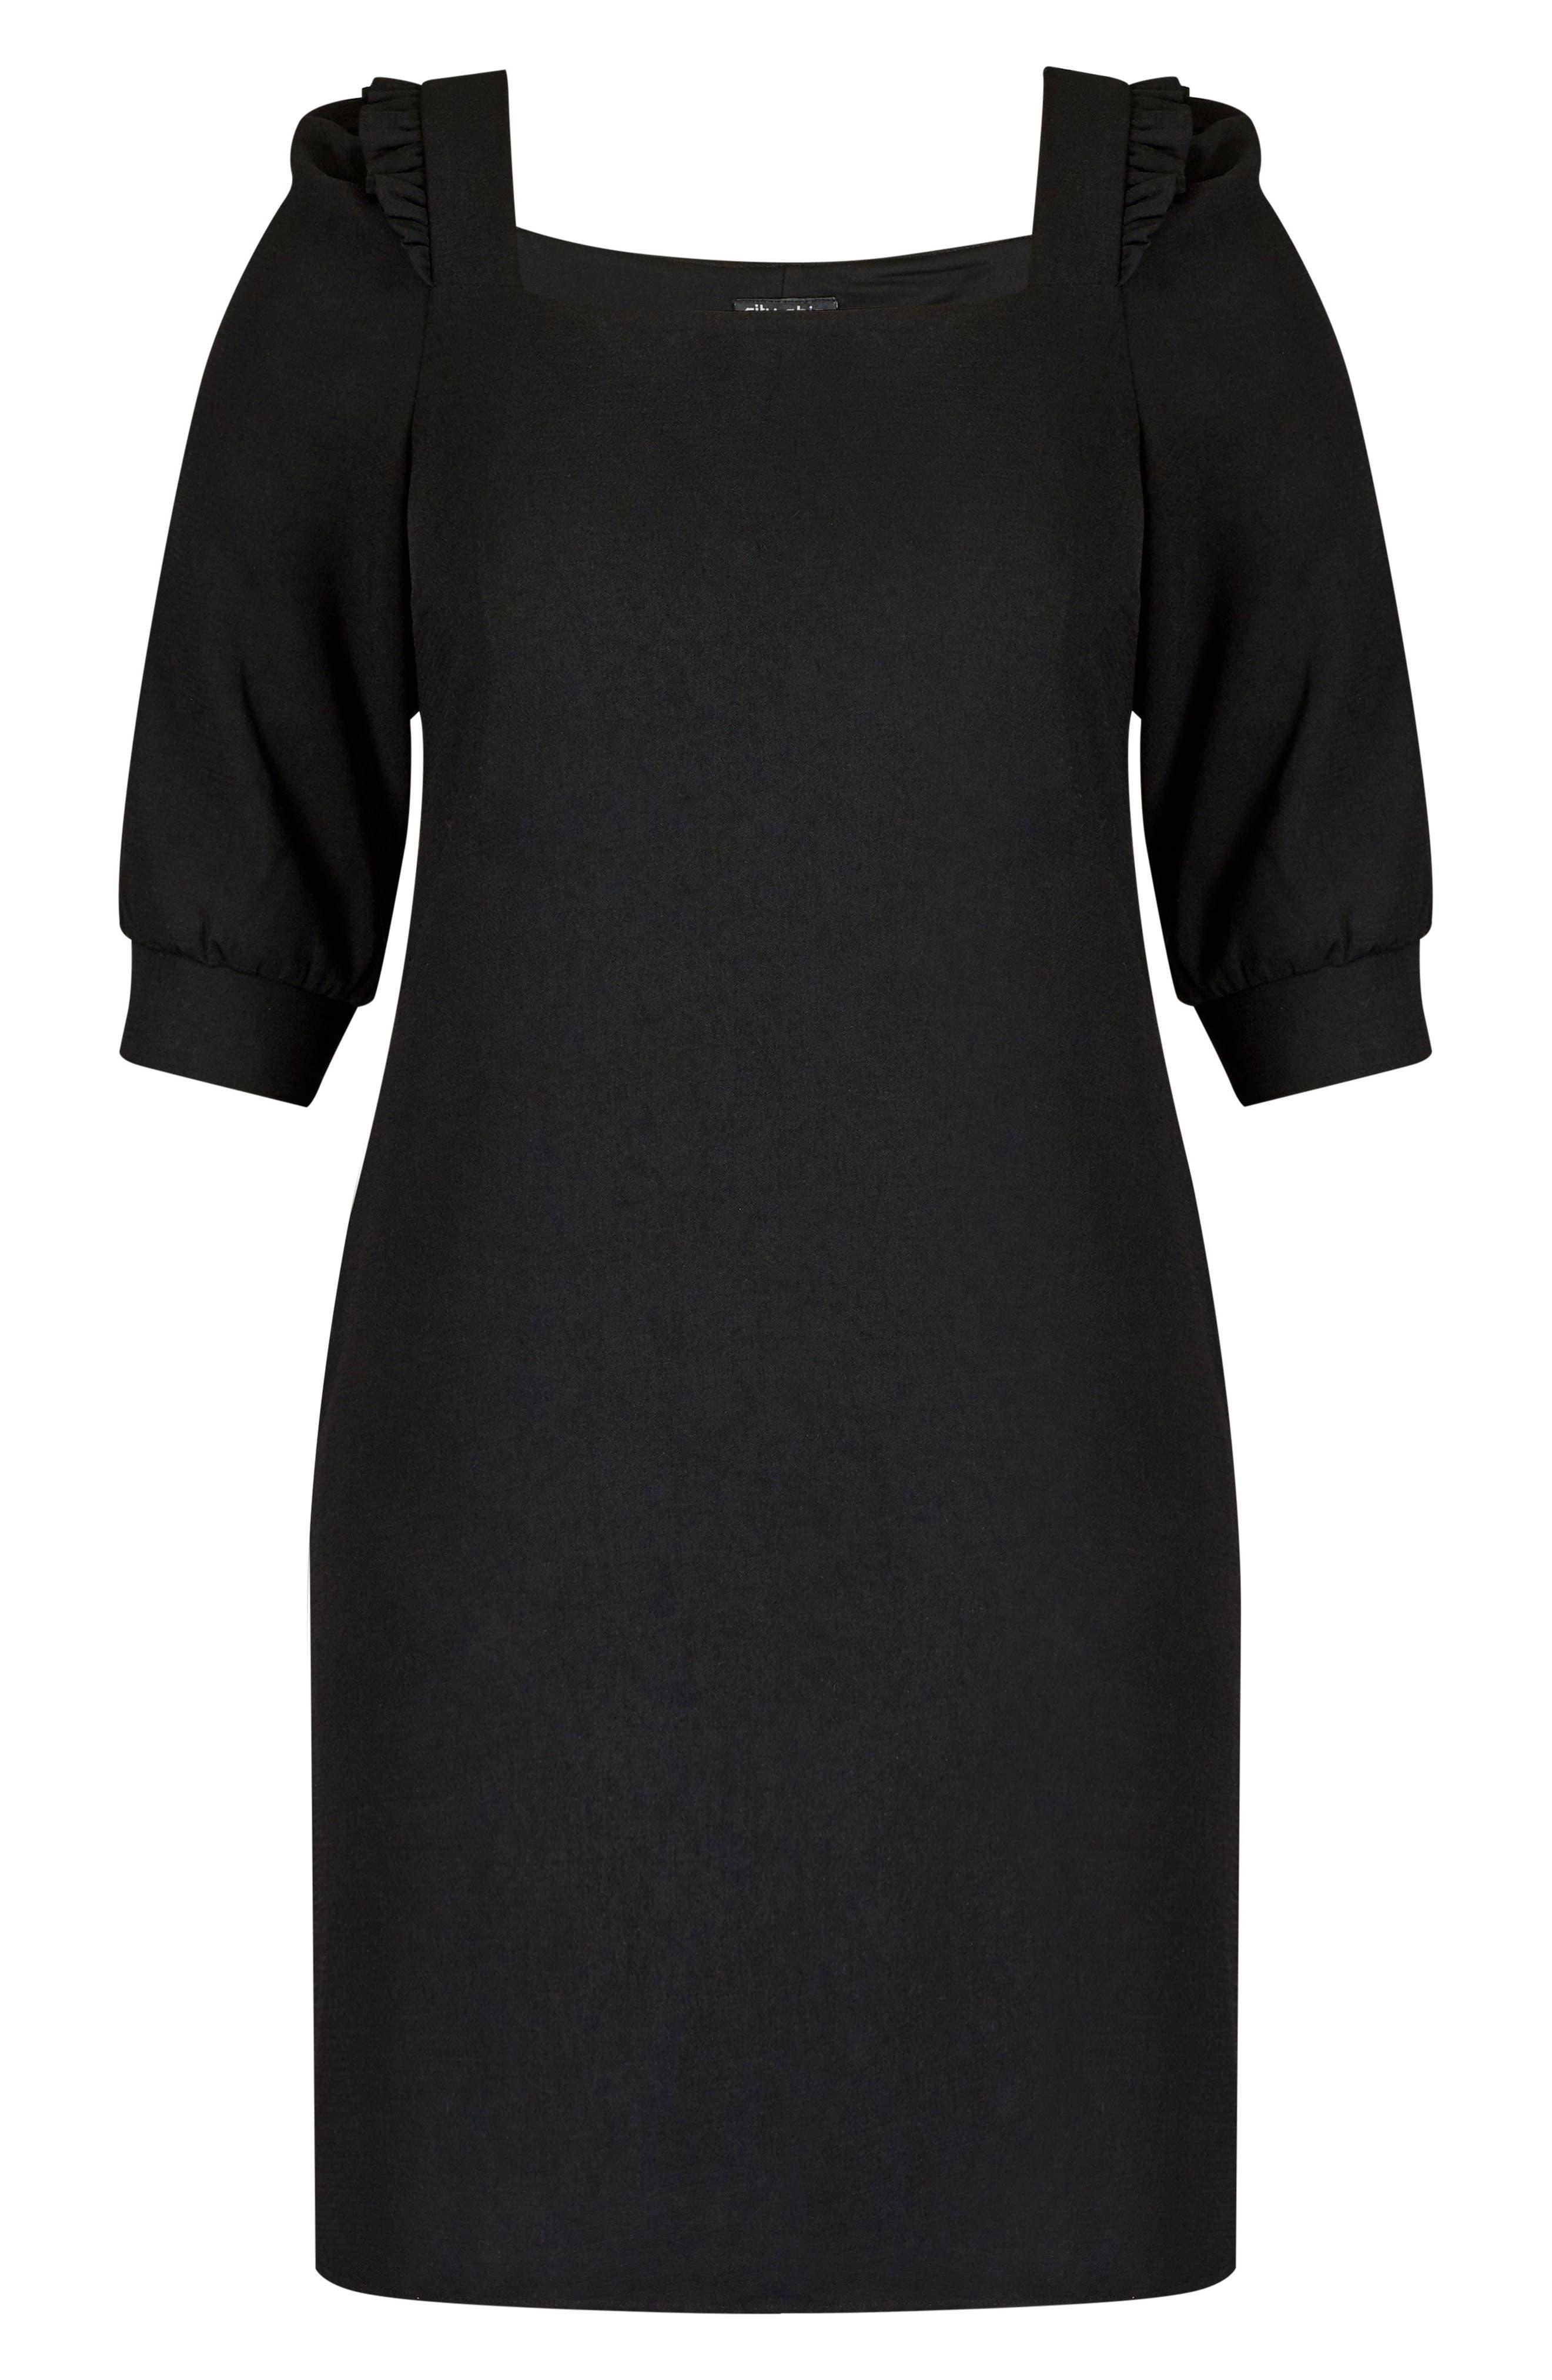 Darling Square Neck Dress,                             Alternate thumbnail 3, color,                             BLACK